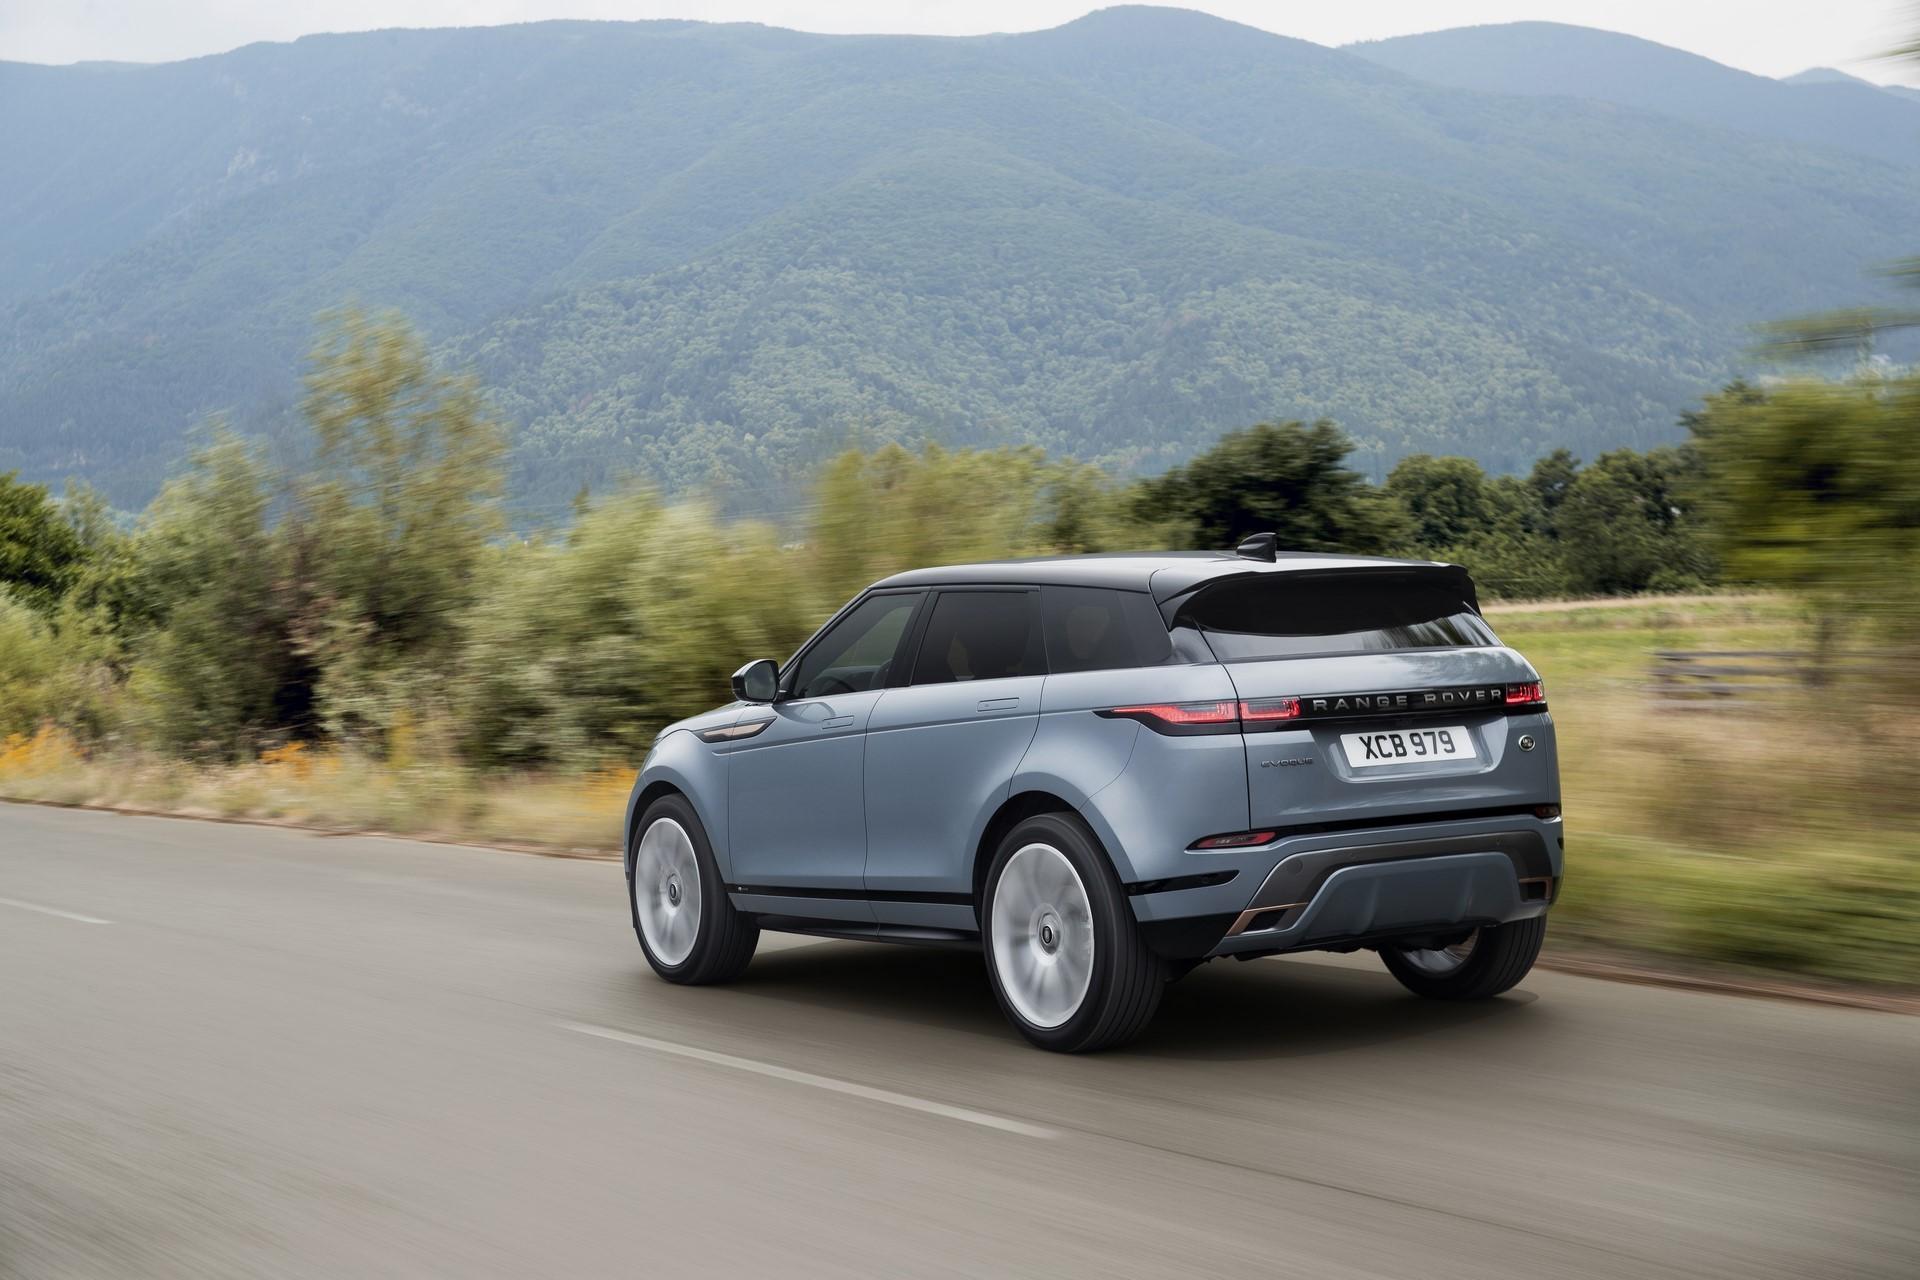 Range Rover Evoque 2019 (40)